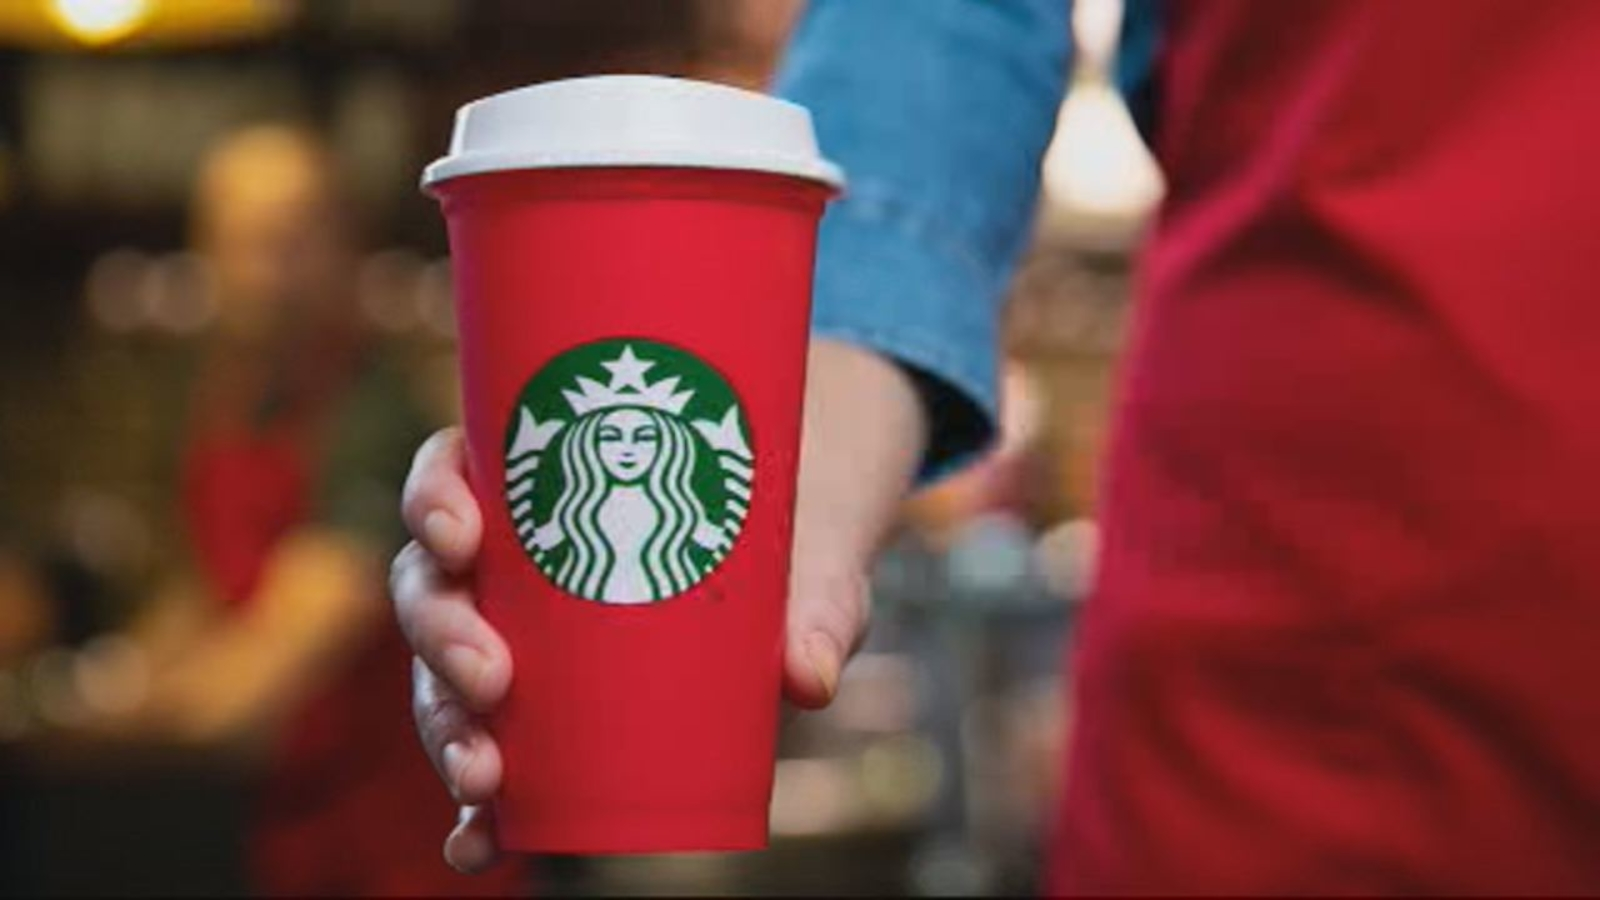 ff120ec59fe Starbucks giving away free holiday coffee cups | abc7news.com